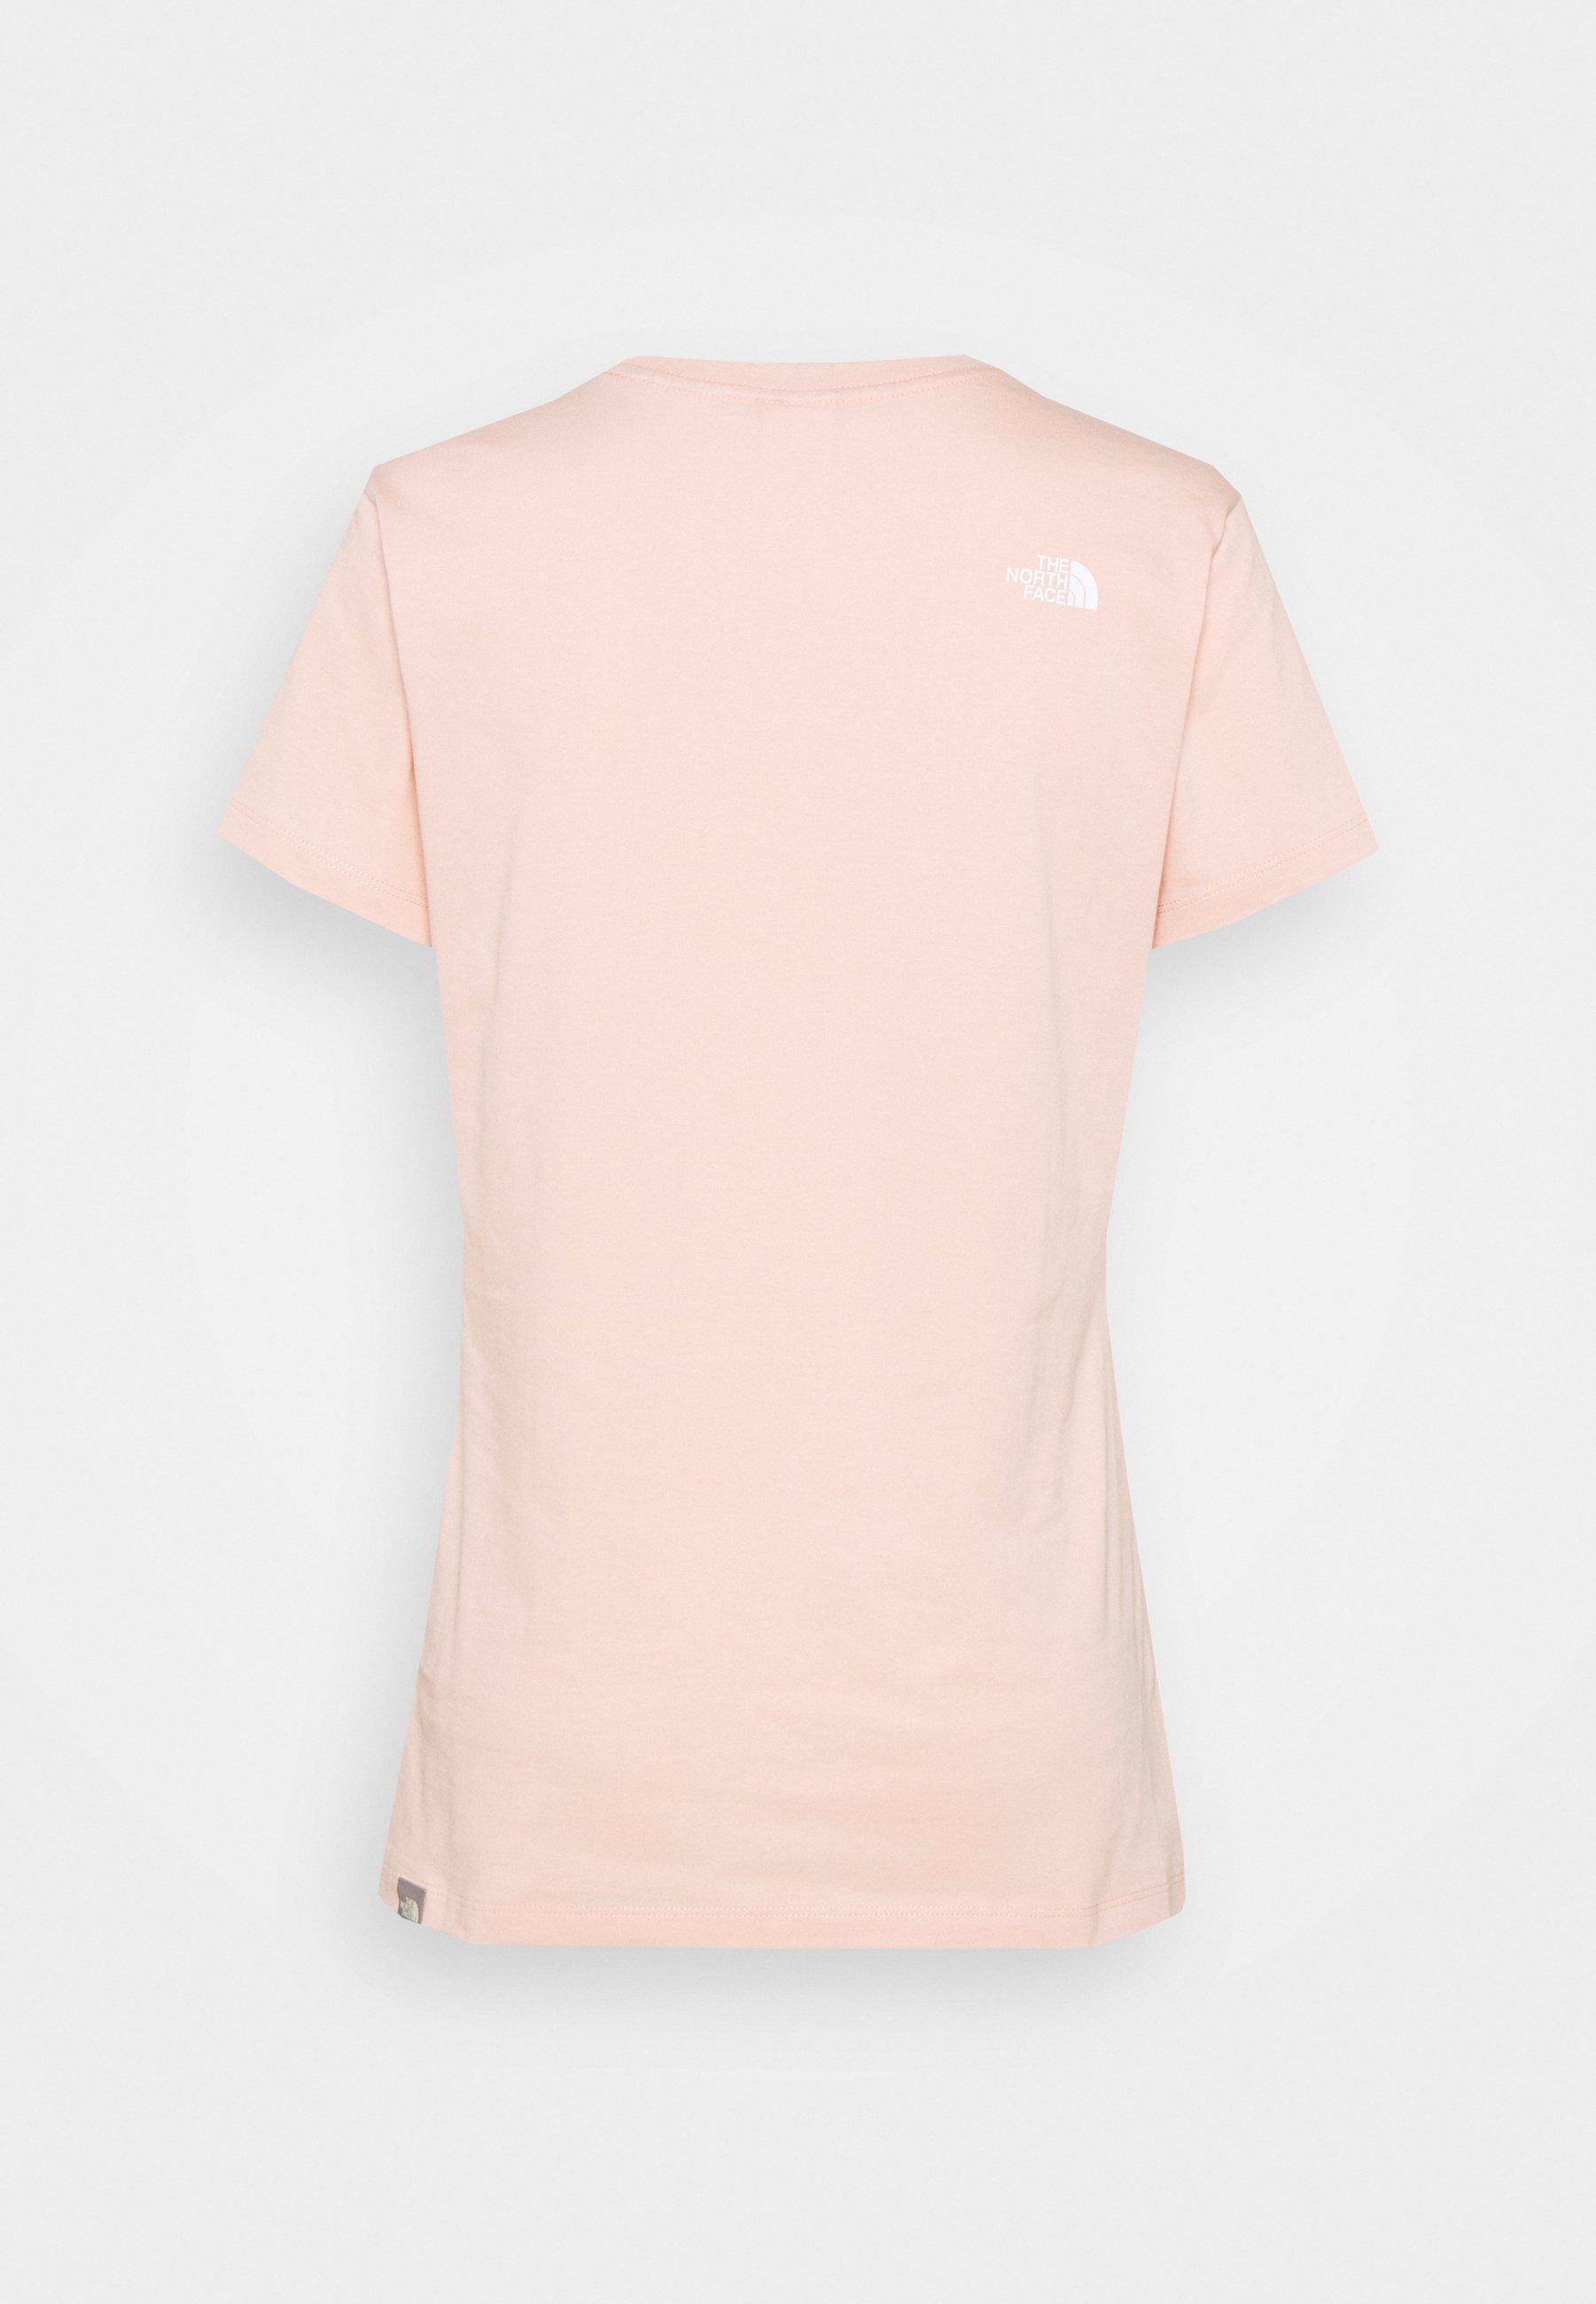 Femme SIMPLE DOME TEE - T-shirt basique